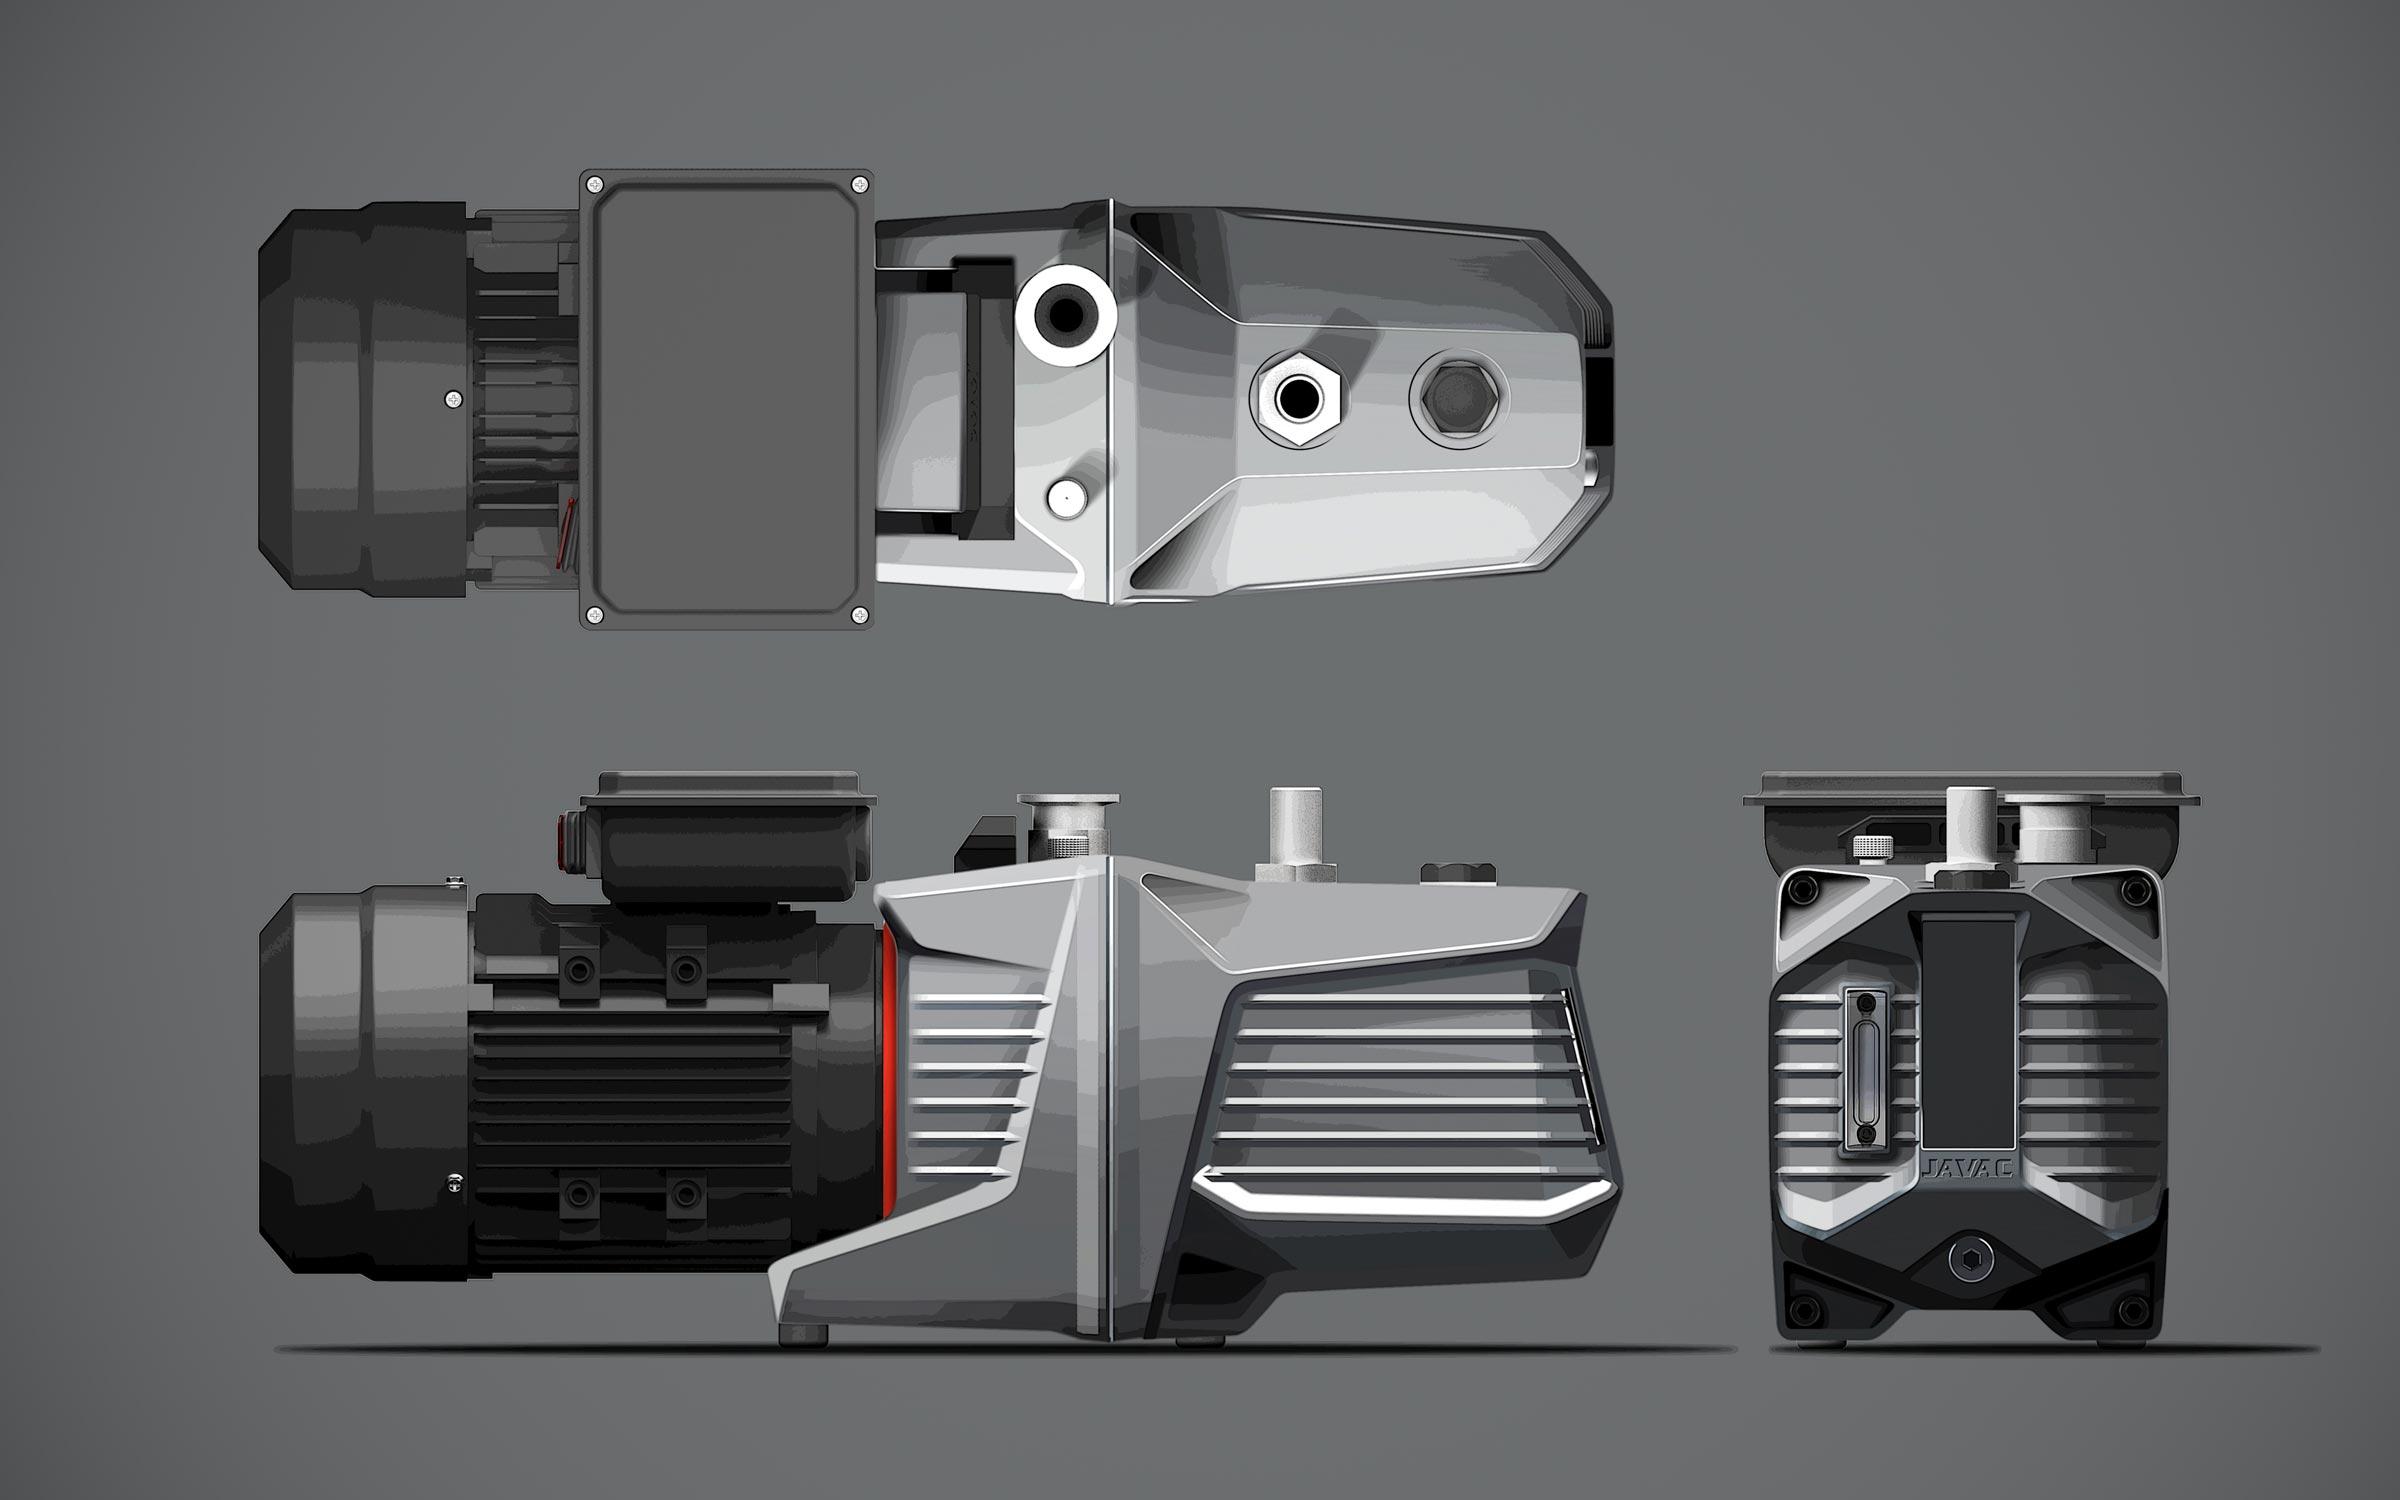 Concept refinement sketch